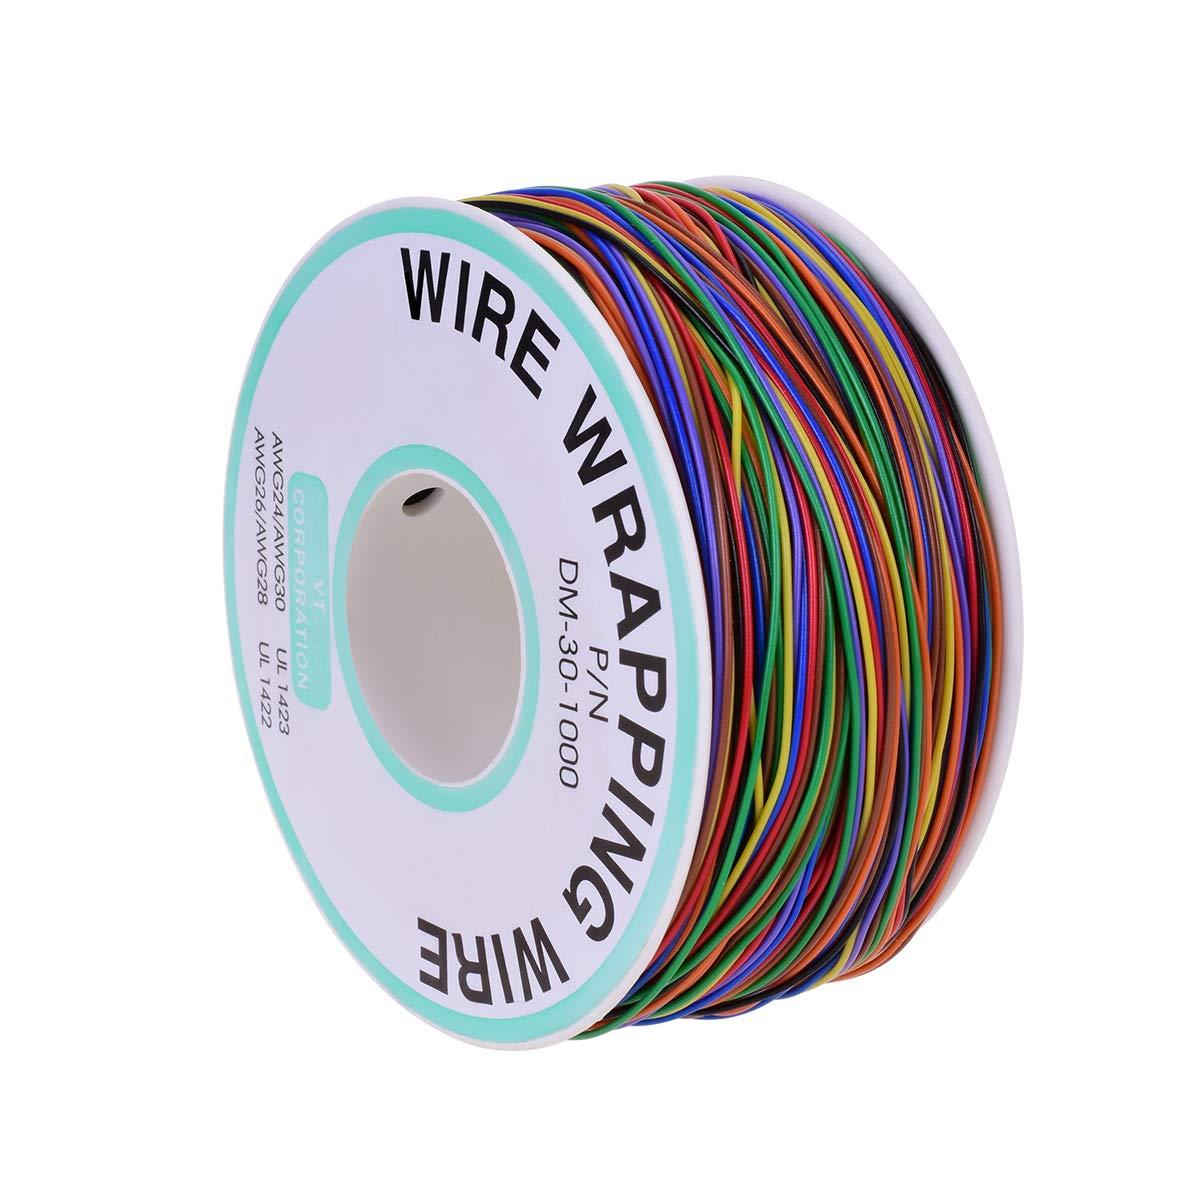 YoungRich Cable de Prueba de Aislamiento de 280 m Wrapping Cable de Cobre Estañado 30AWG 8